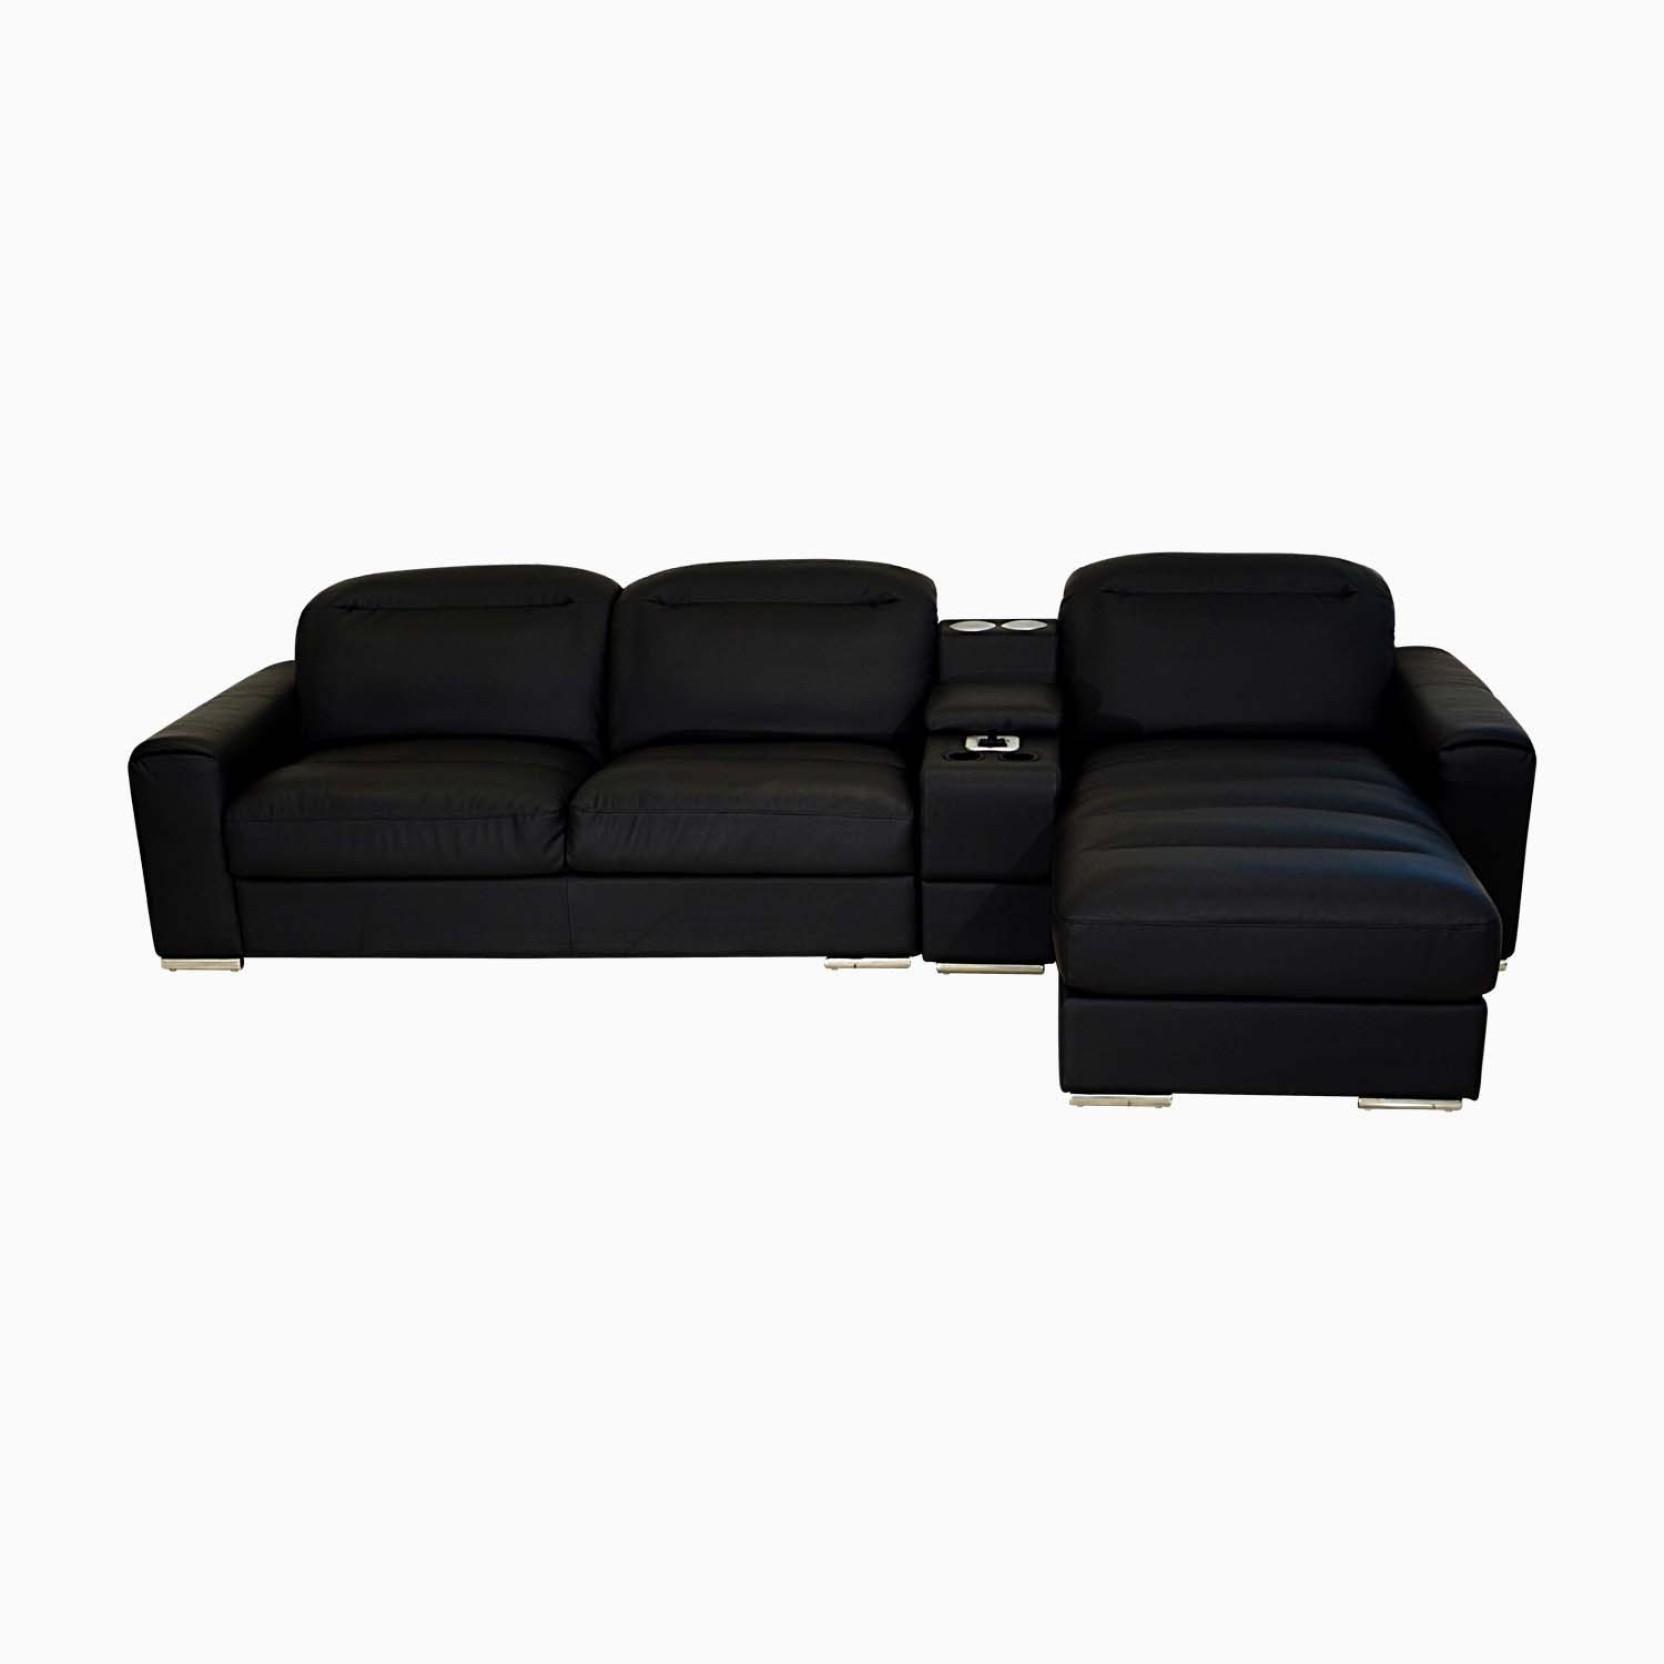 Sectional Sofa India Online: Godrej Interio ACOUSTICA L-SHAPE BLK SOFA Leatherette 3